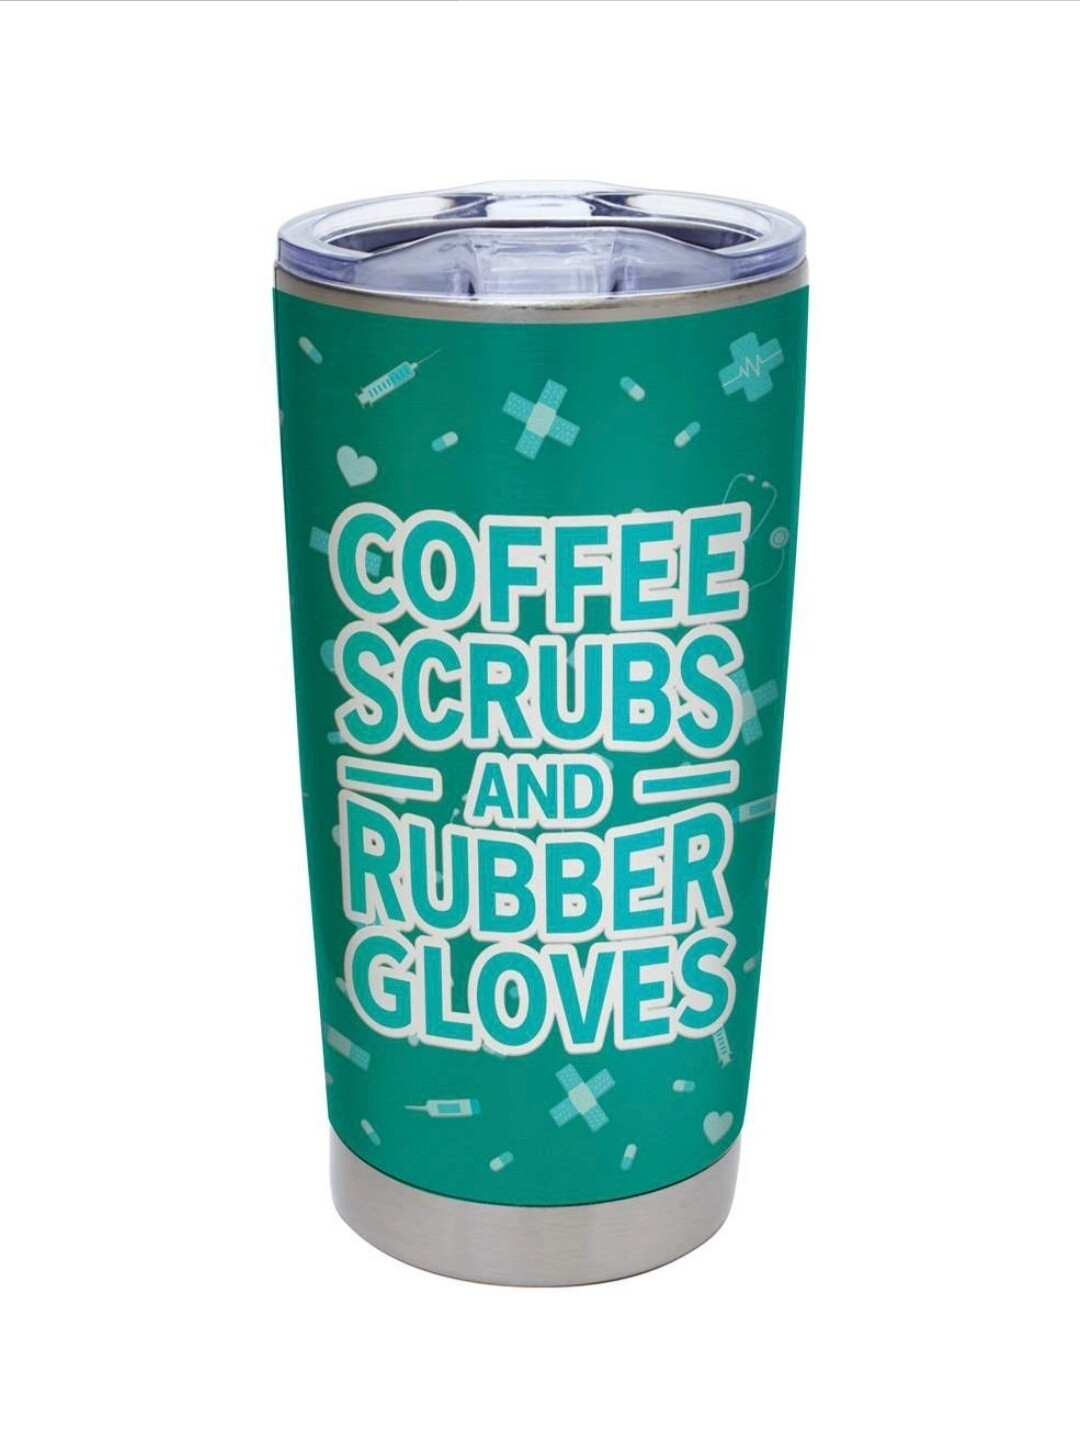 Carson 20oz Stainless Steel Tumbler - Coffee, Scrubs & Rubber Gloves